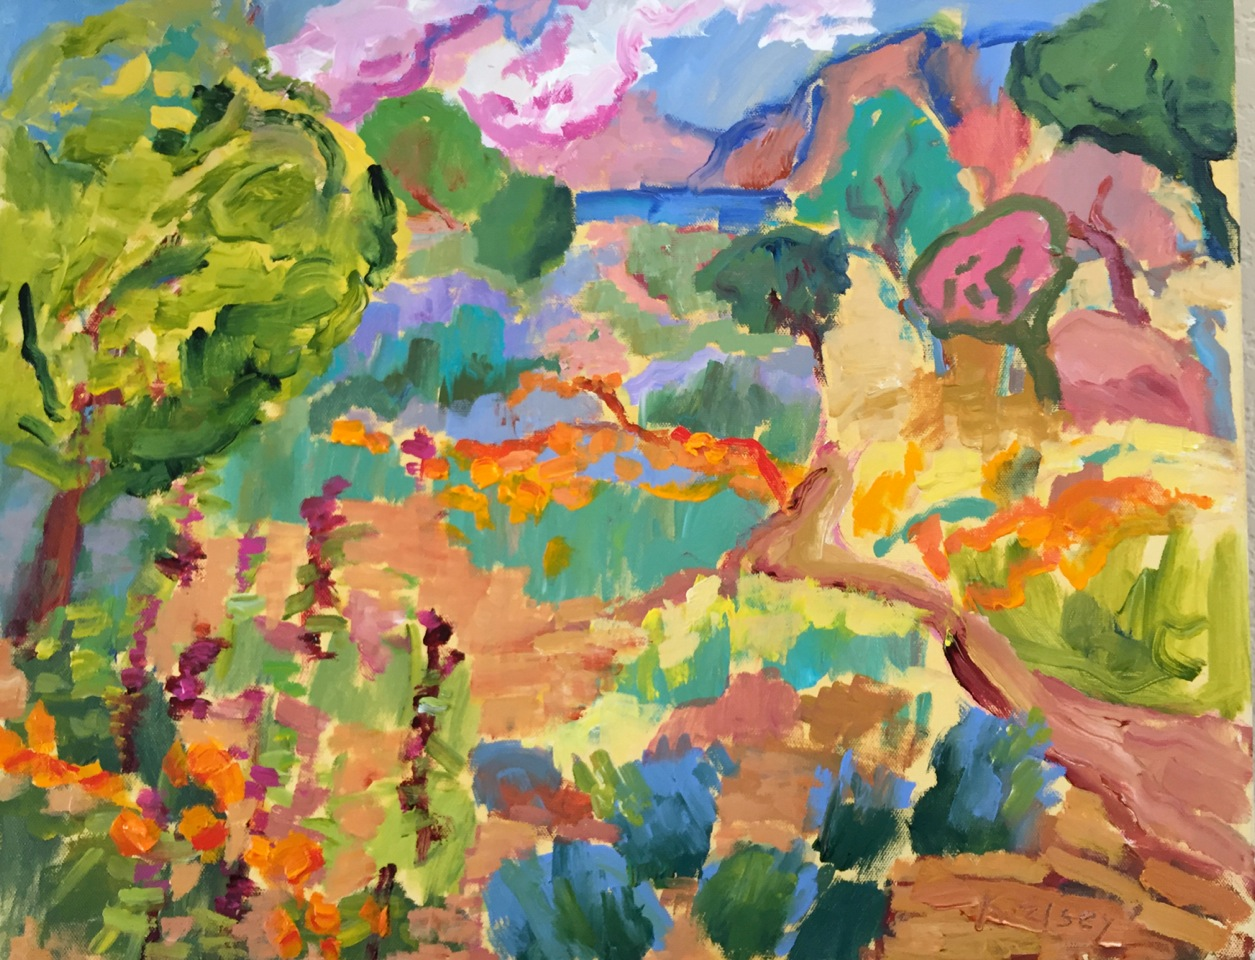 Flower Garden 16 x 20 acrylic on linen